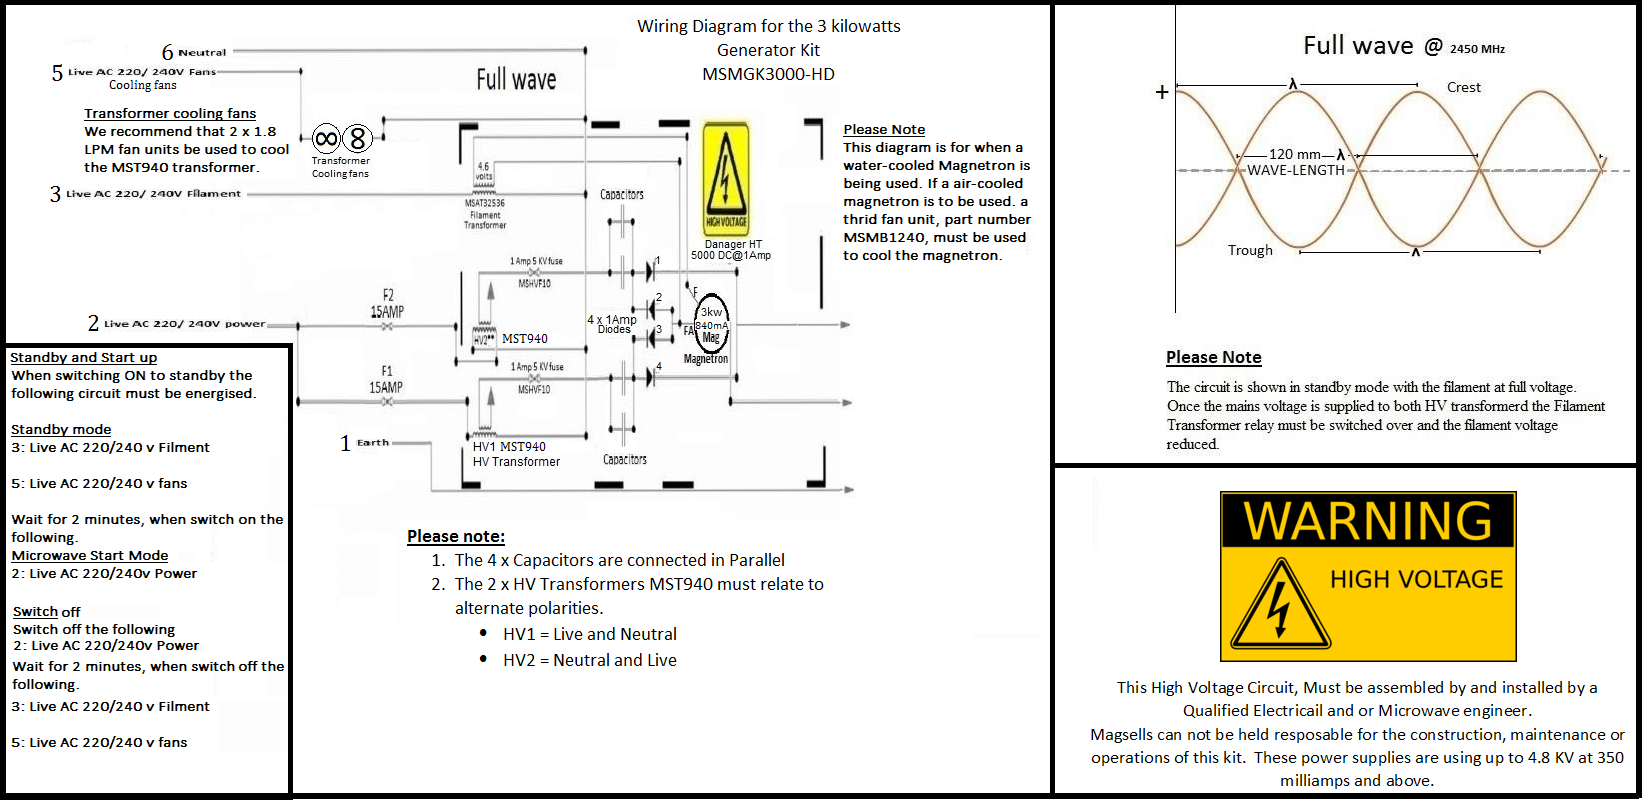 3 Kilowatts Kit Wiring Diagram Magsells Microwave Oven Parts Circuit